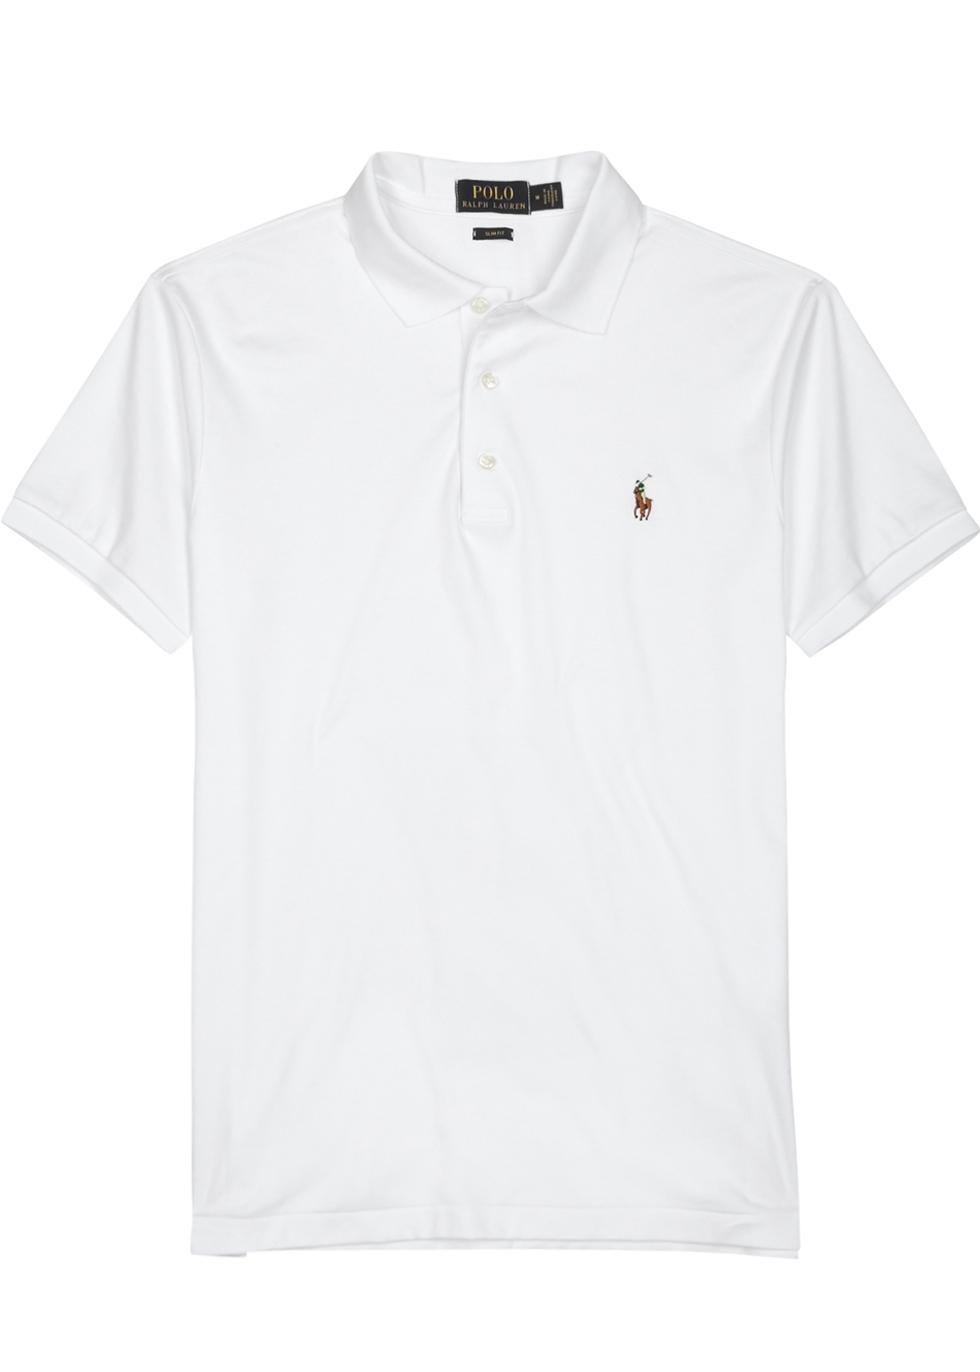 d73fcb826 Polo Ralph Lauren Polo Shirts, T-Shirts, Jumpers - Harvey Nichols